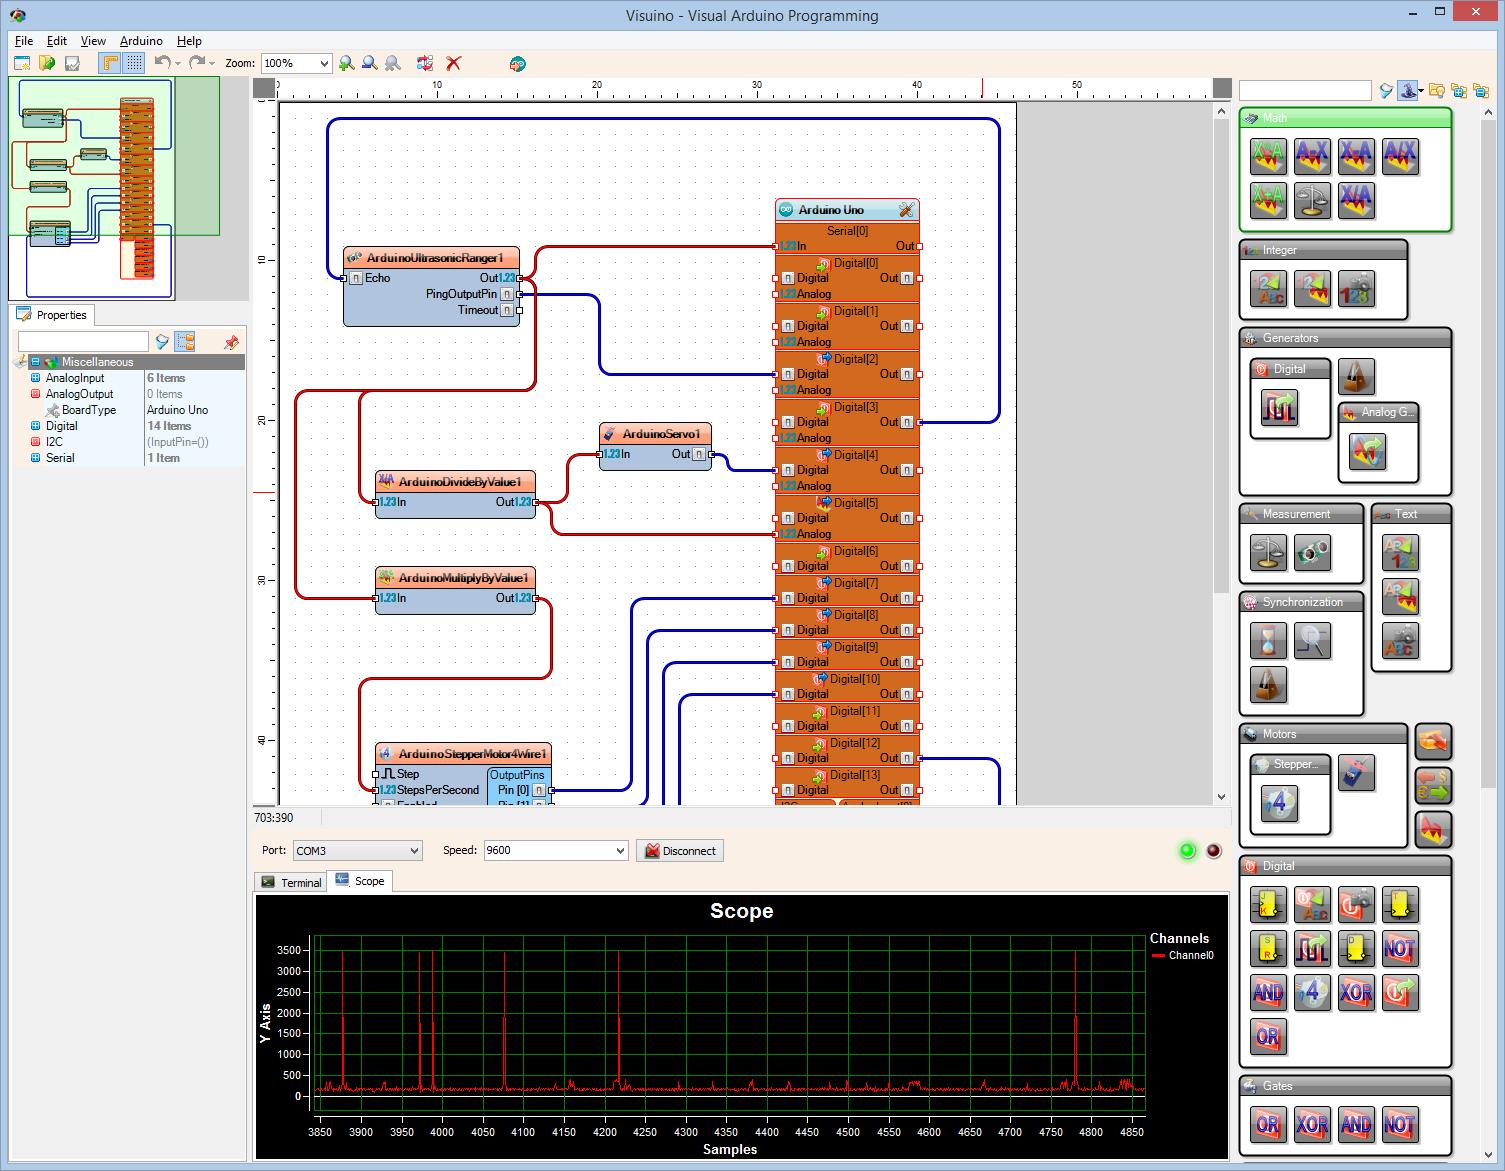 New visual arduino programming tool